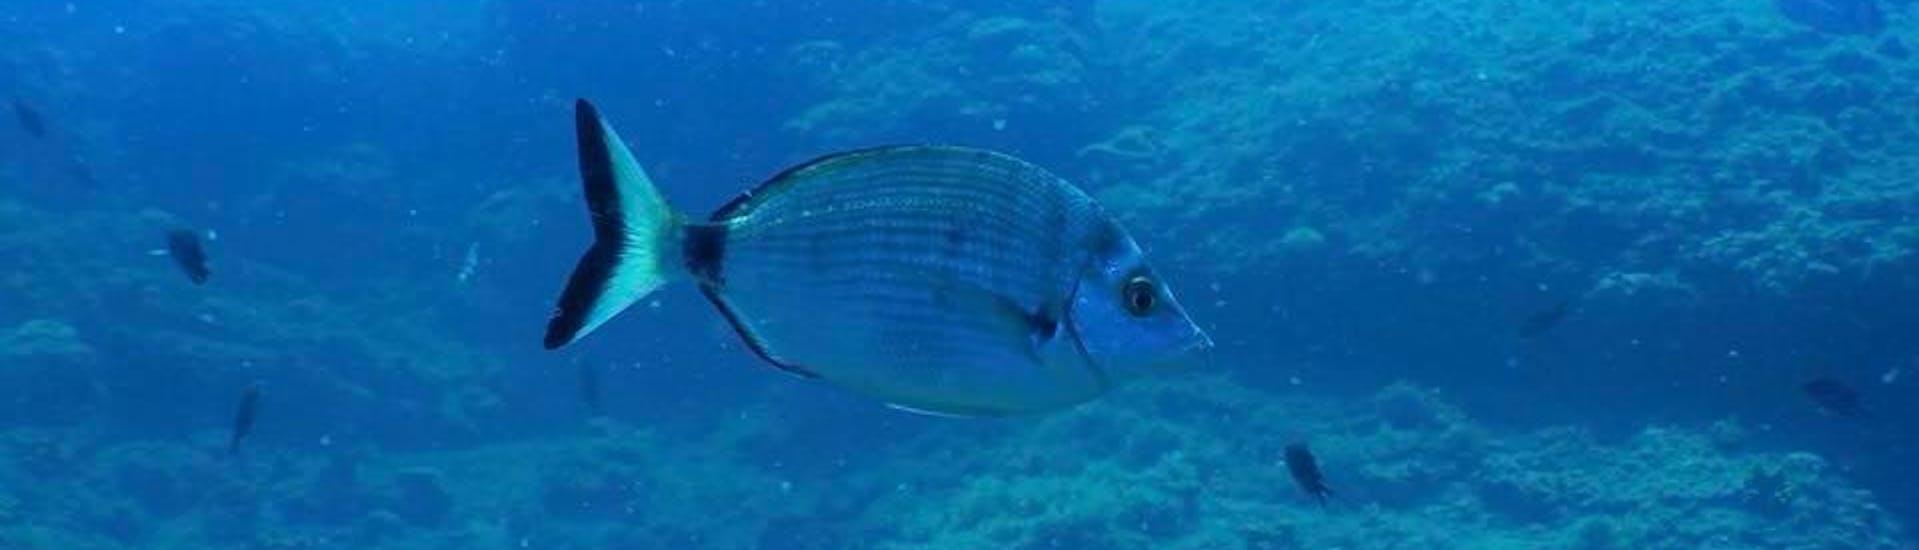 Trial Scuba Diving for Beginners - Veštar Bay